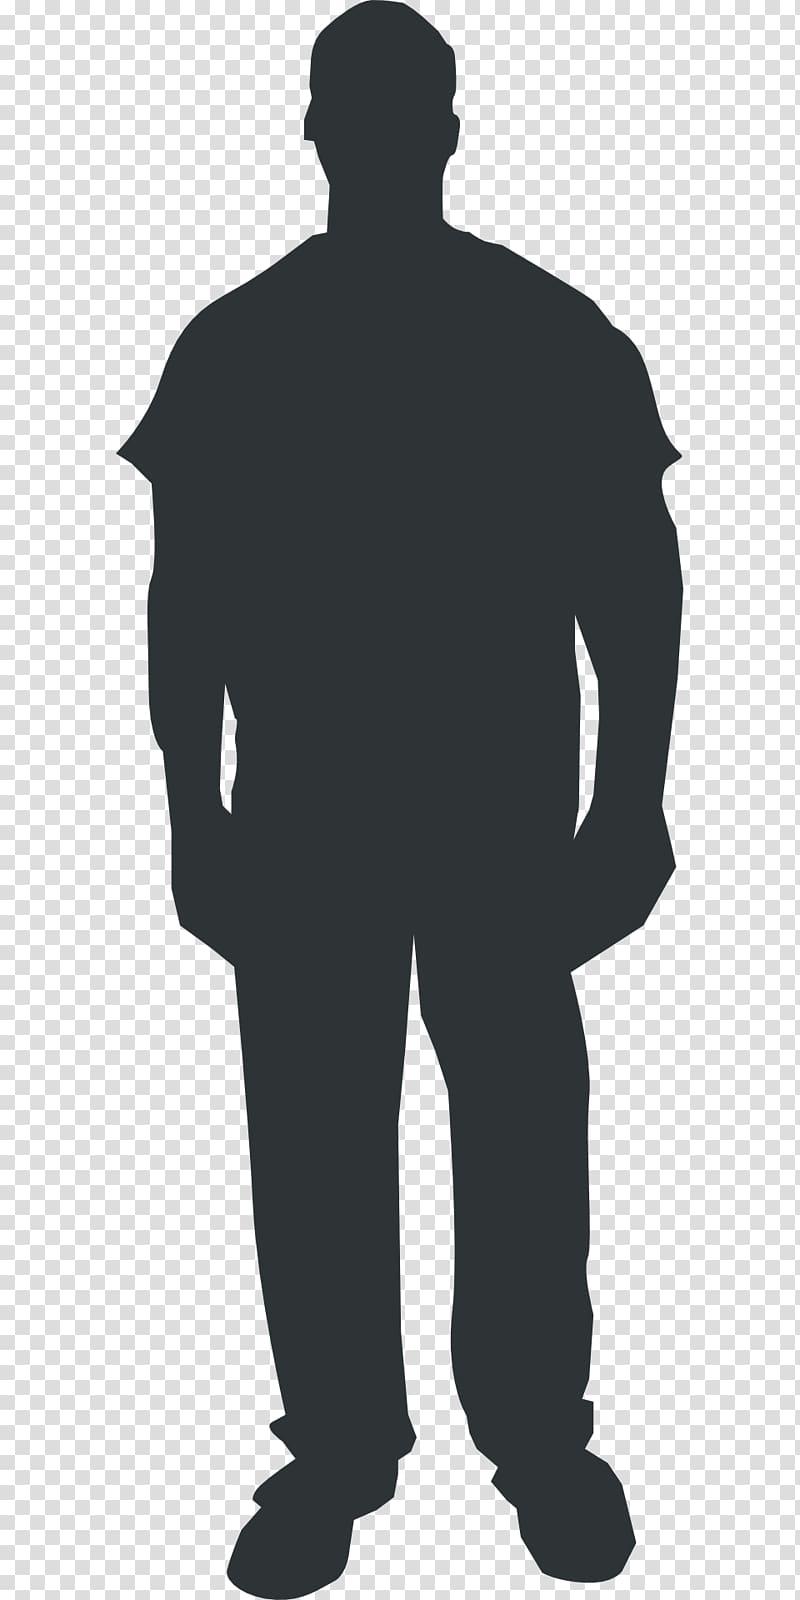 Homo sapiens Person , silhouette man transparent background.